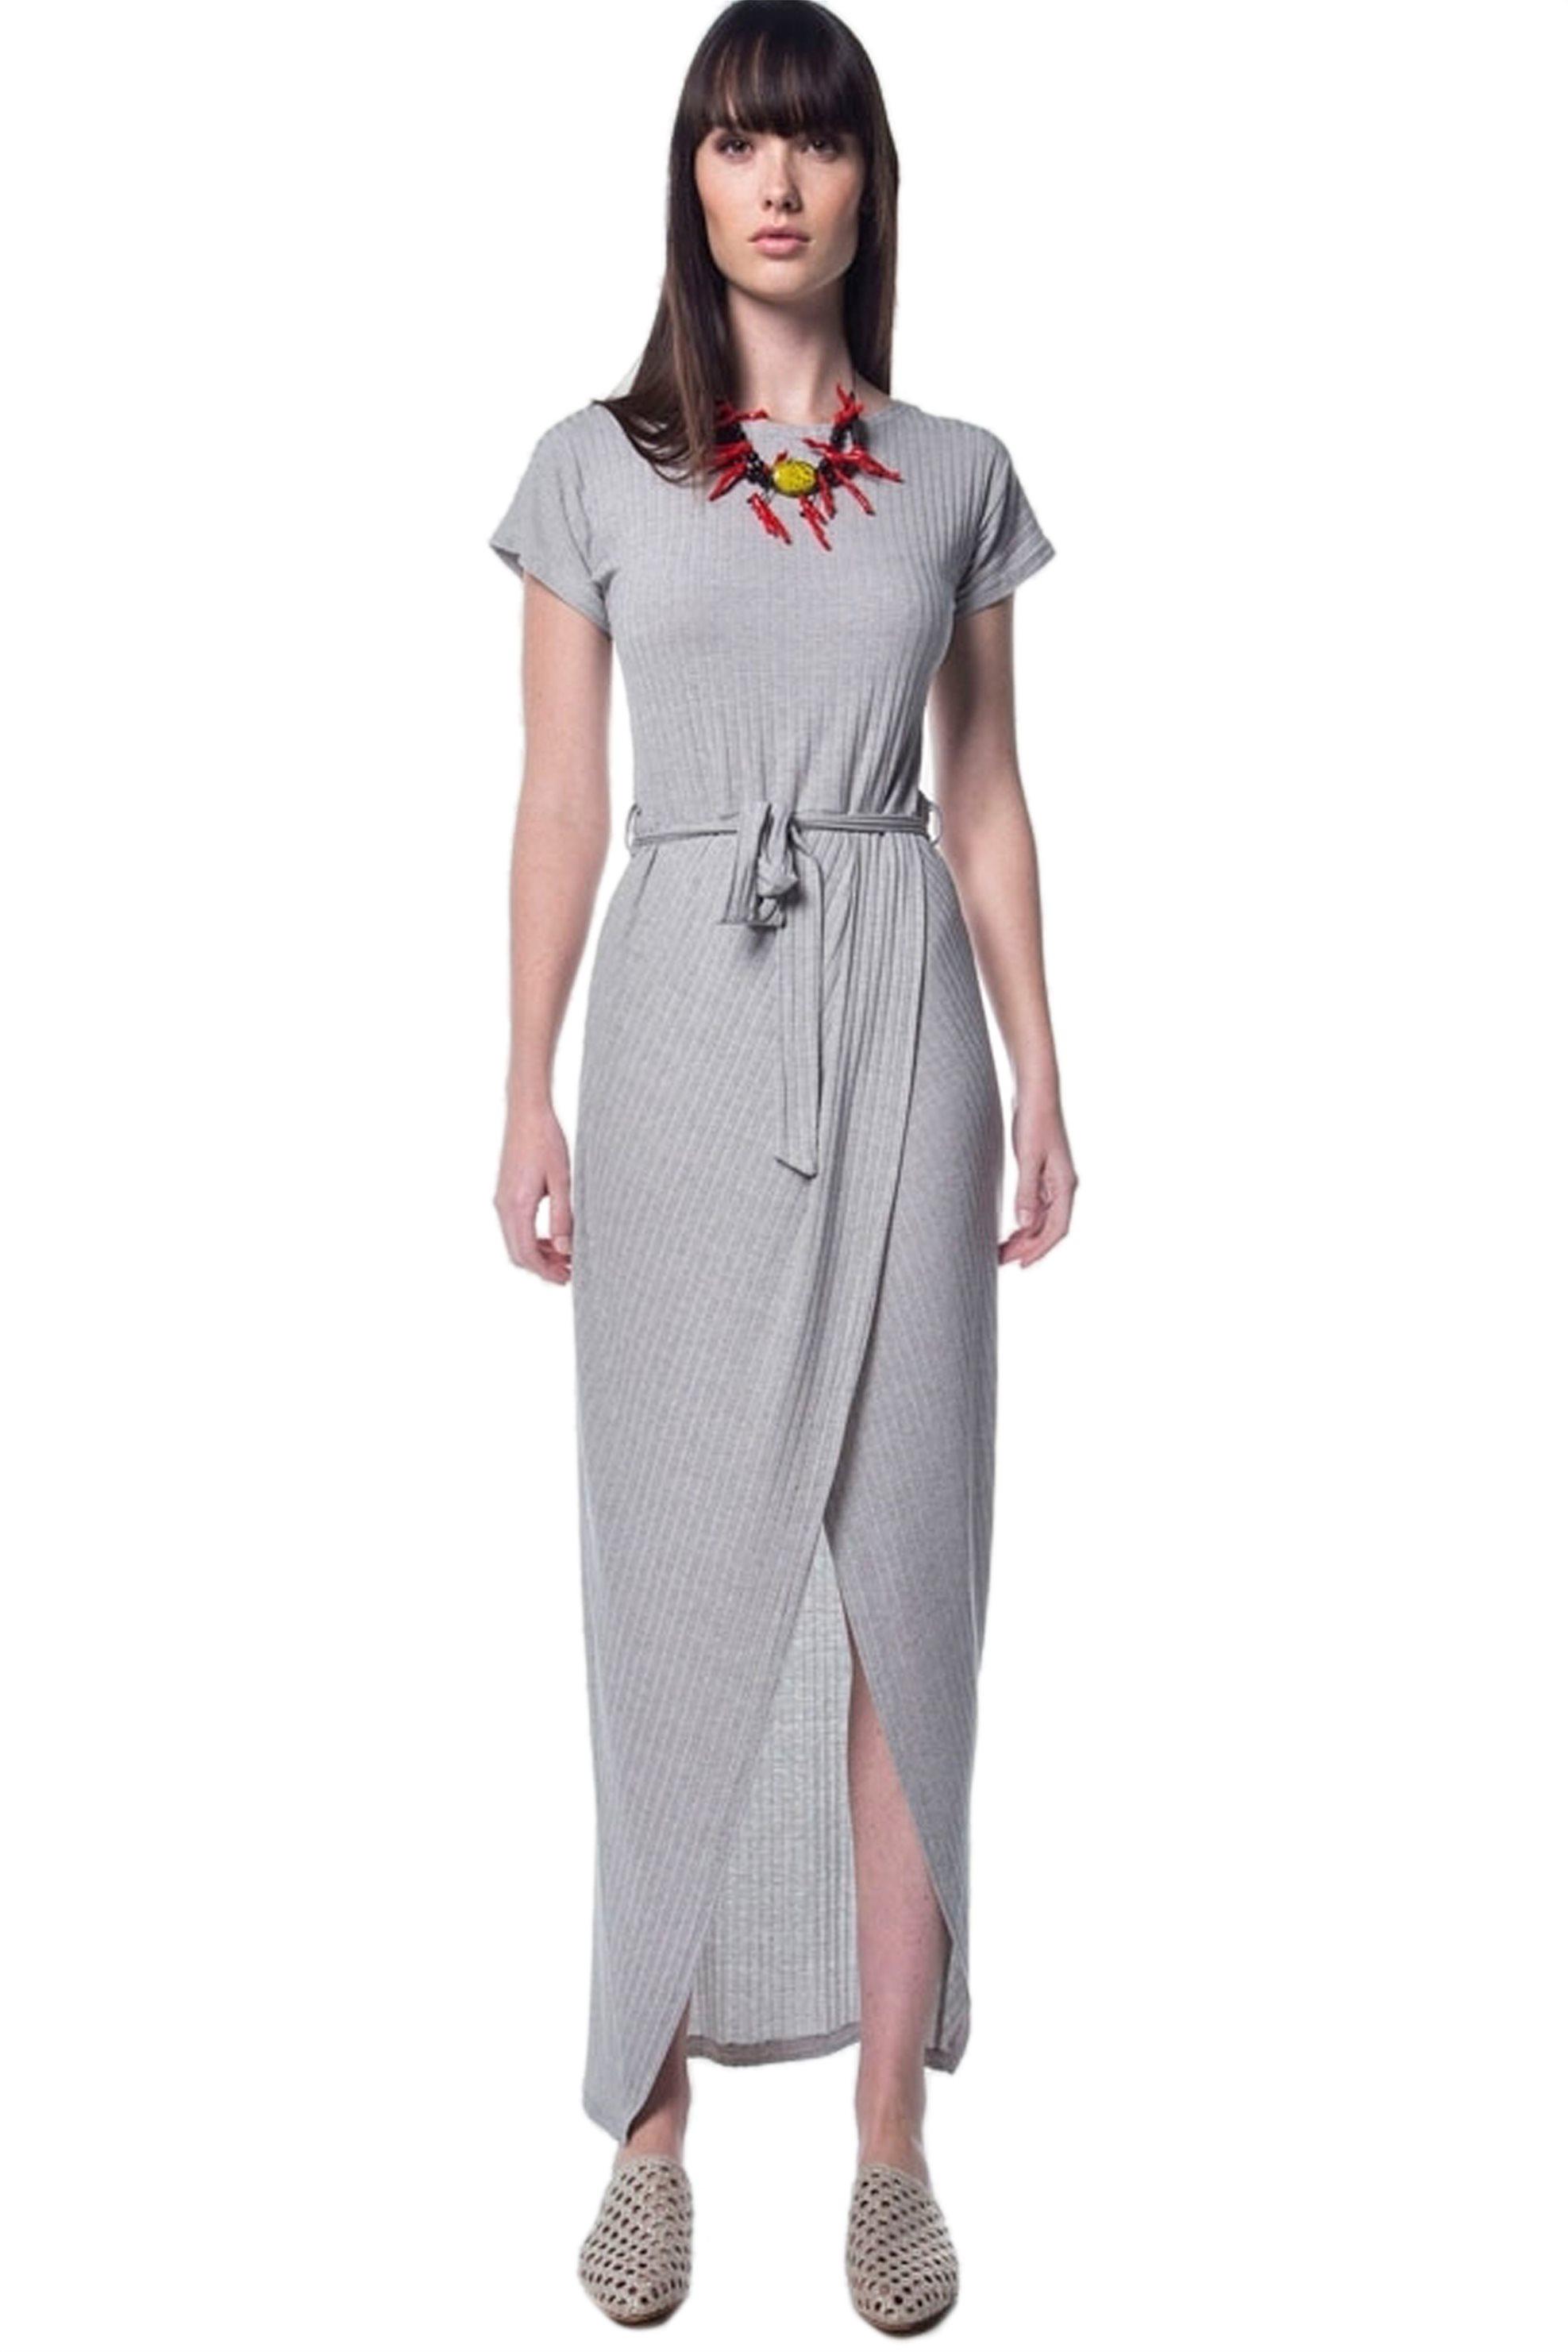 f386baefcce Γυναικεία > Ρούχα > Φορέματα > Καθημερινά / JENNY WHITE DRESS ...